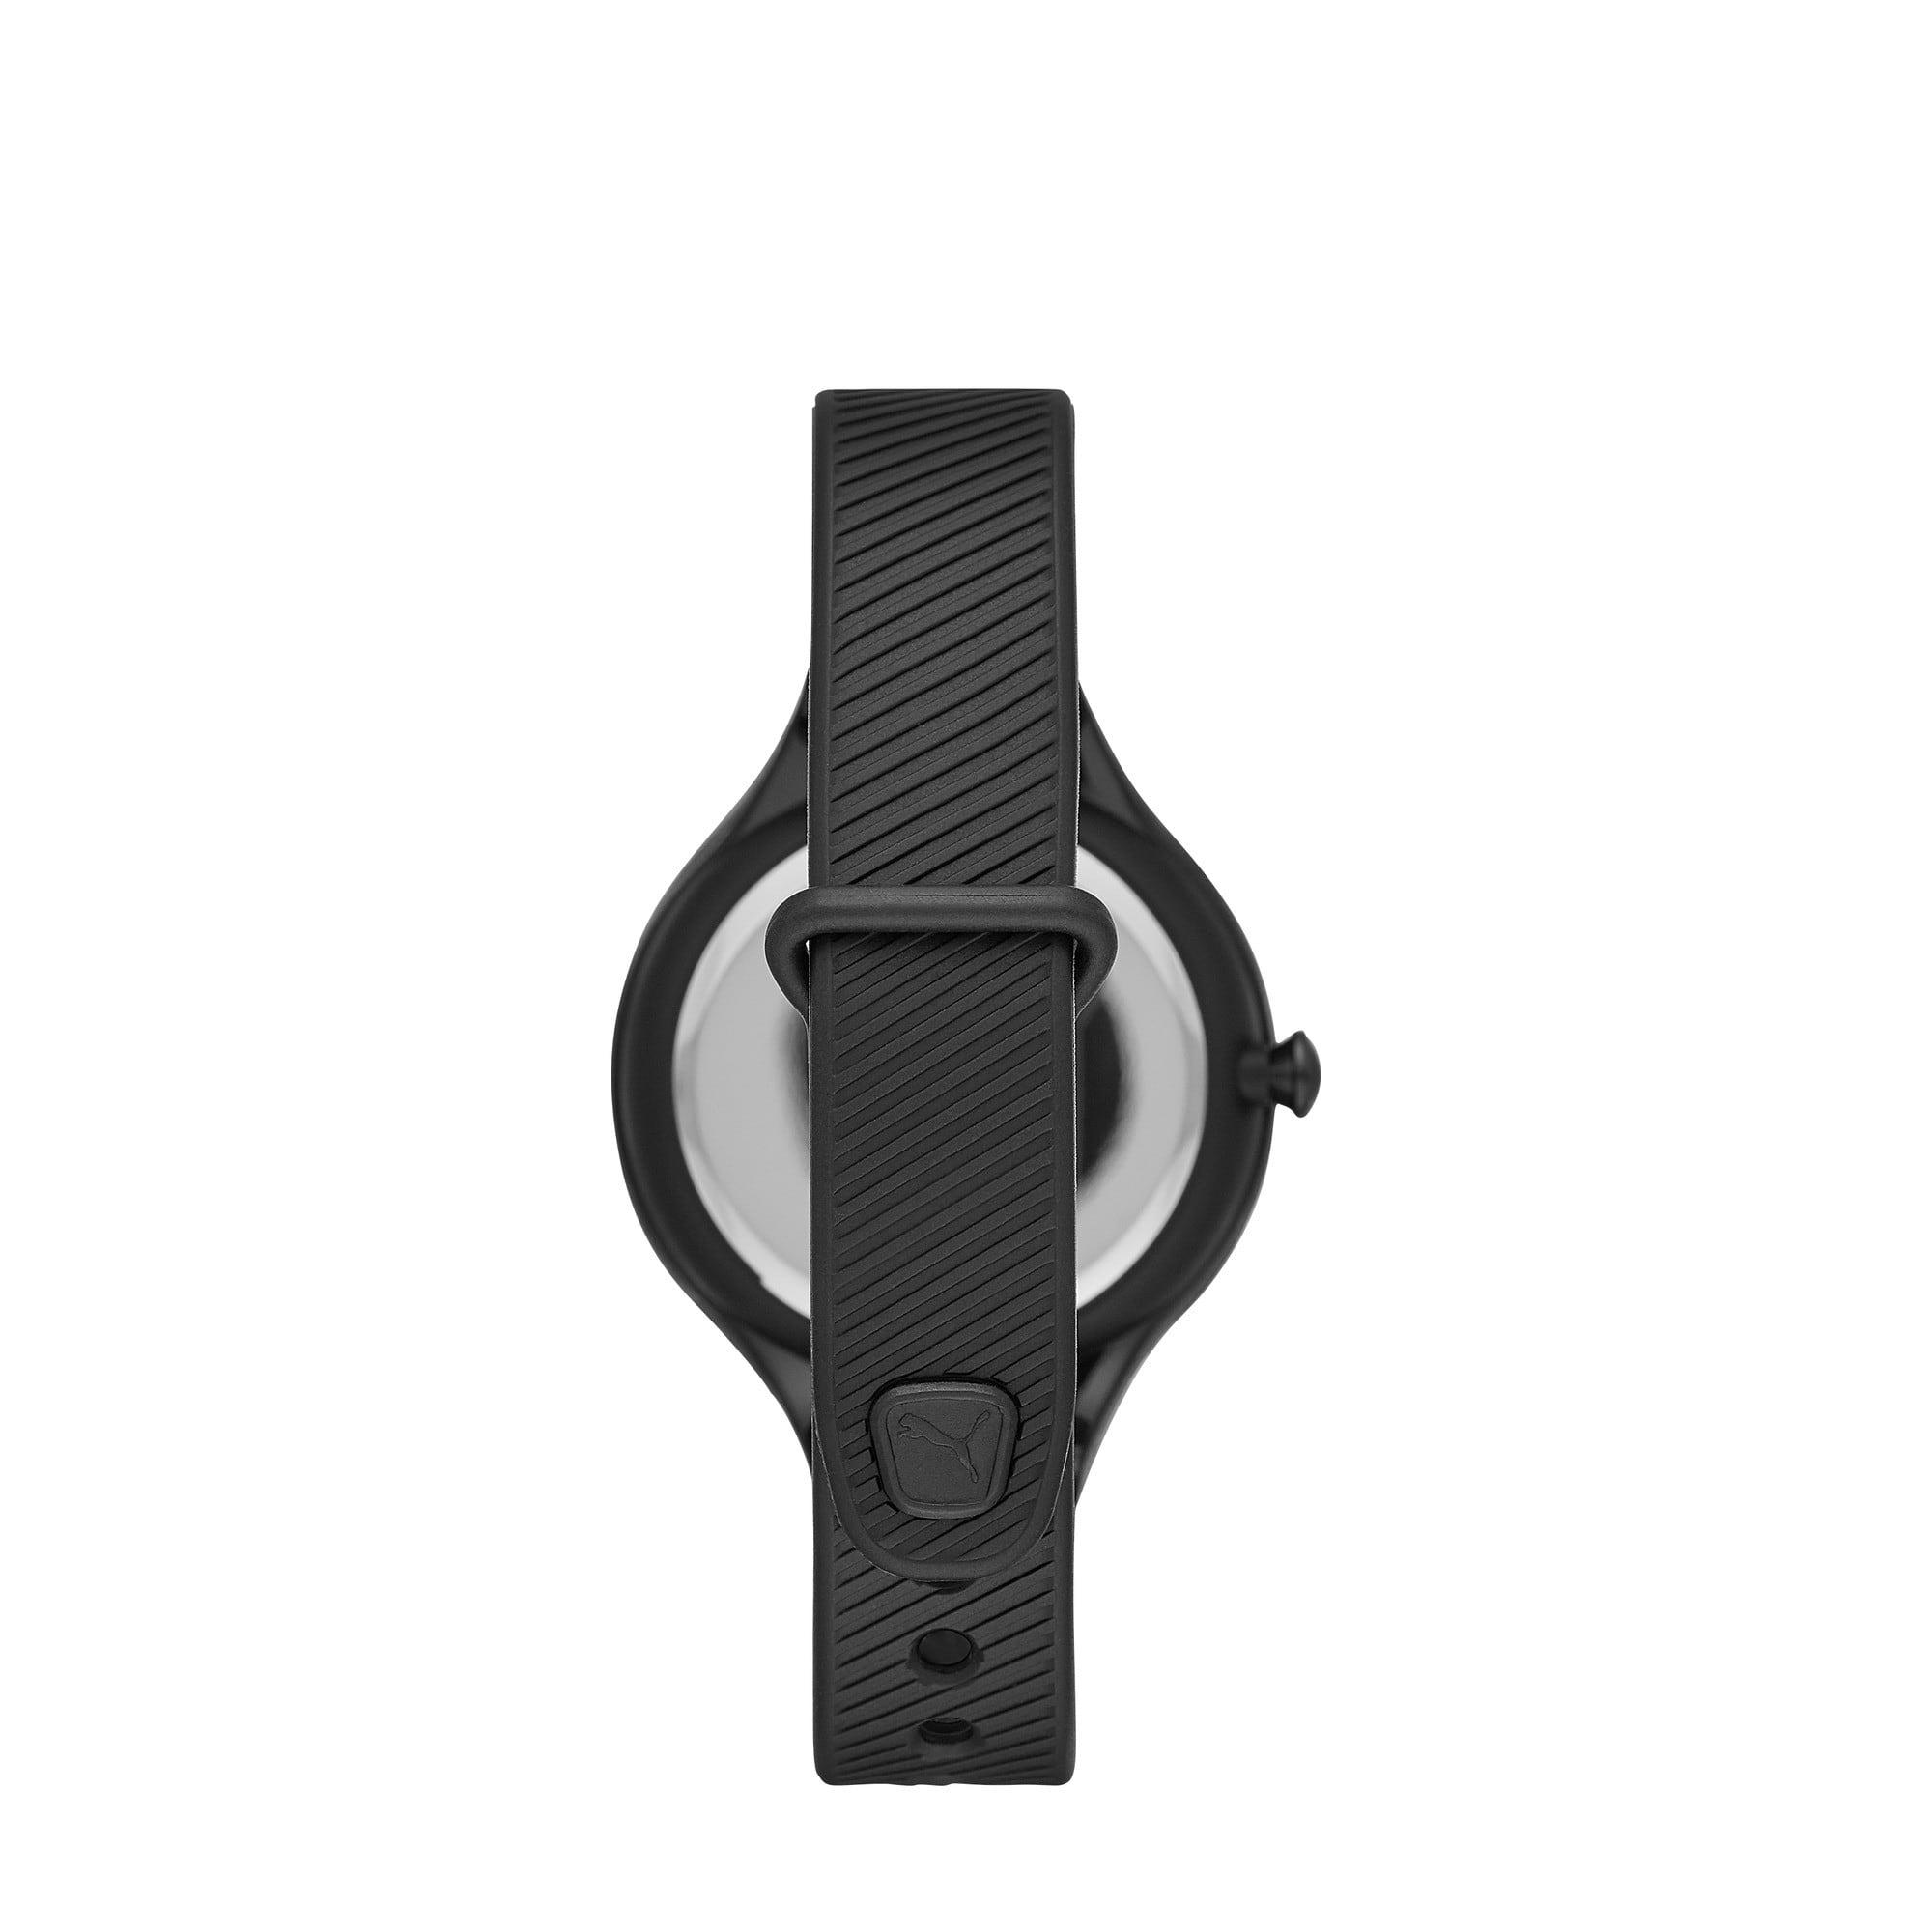 Thumbnail 2 of Contour Black Watch, Black/Black, medium